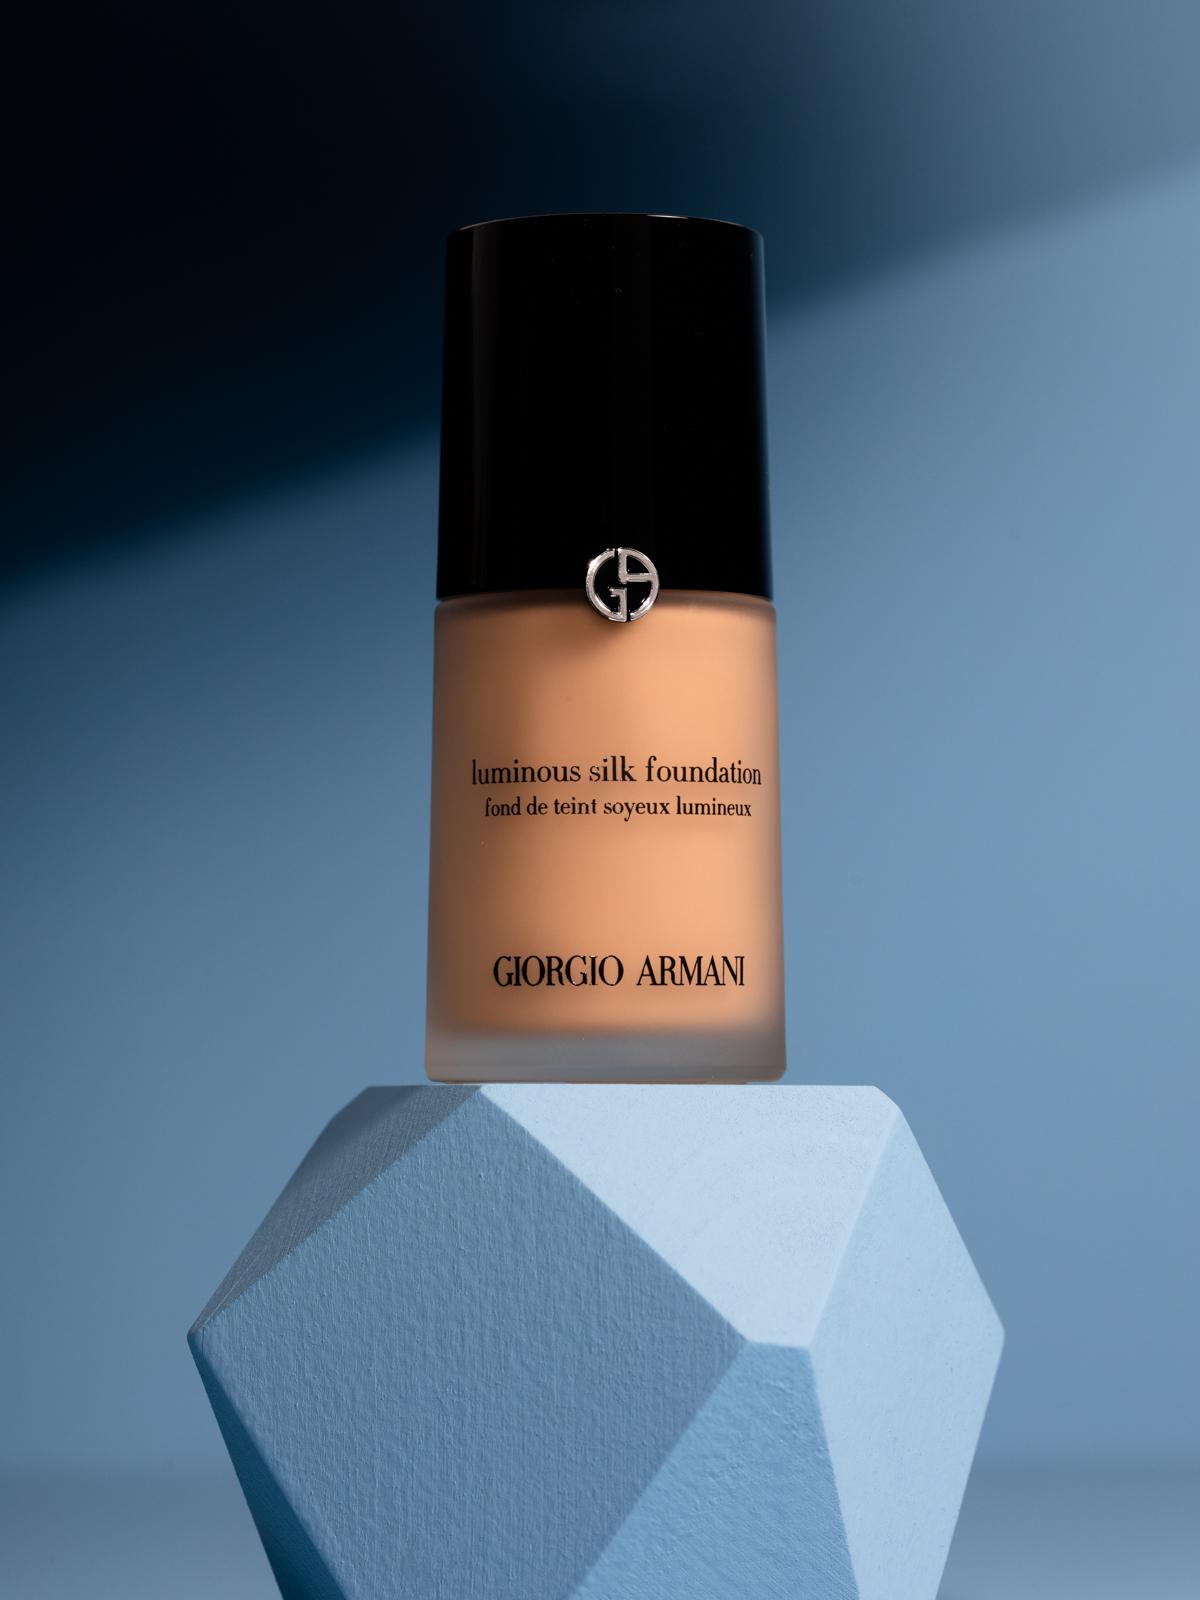 Currant Magazine presents a beauty holy grail: Giorgio Armani Luminous silk foundation.